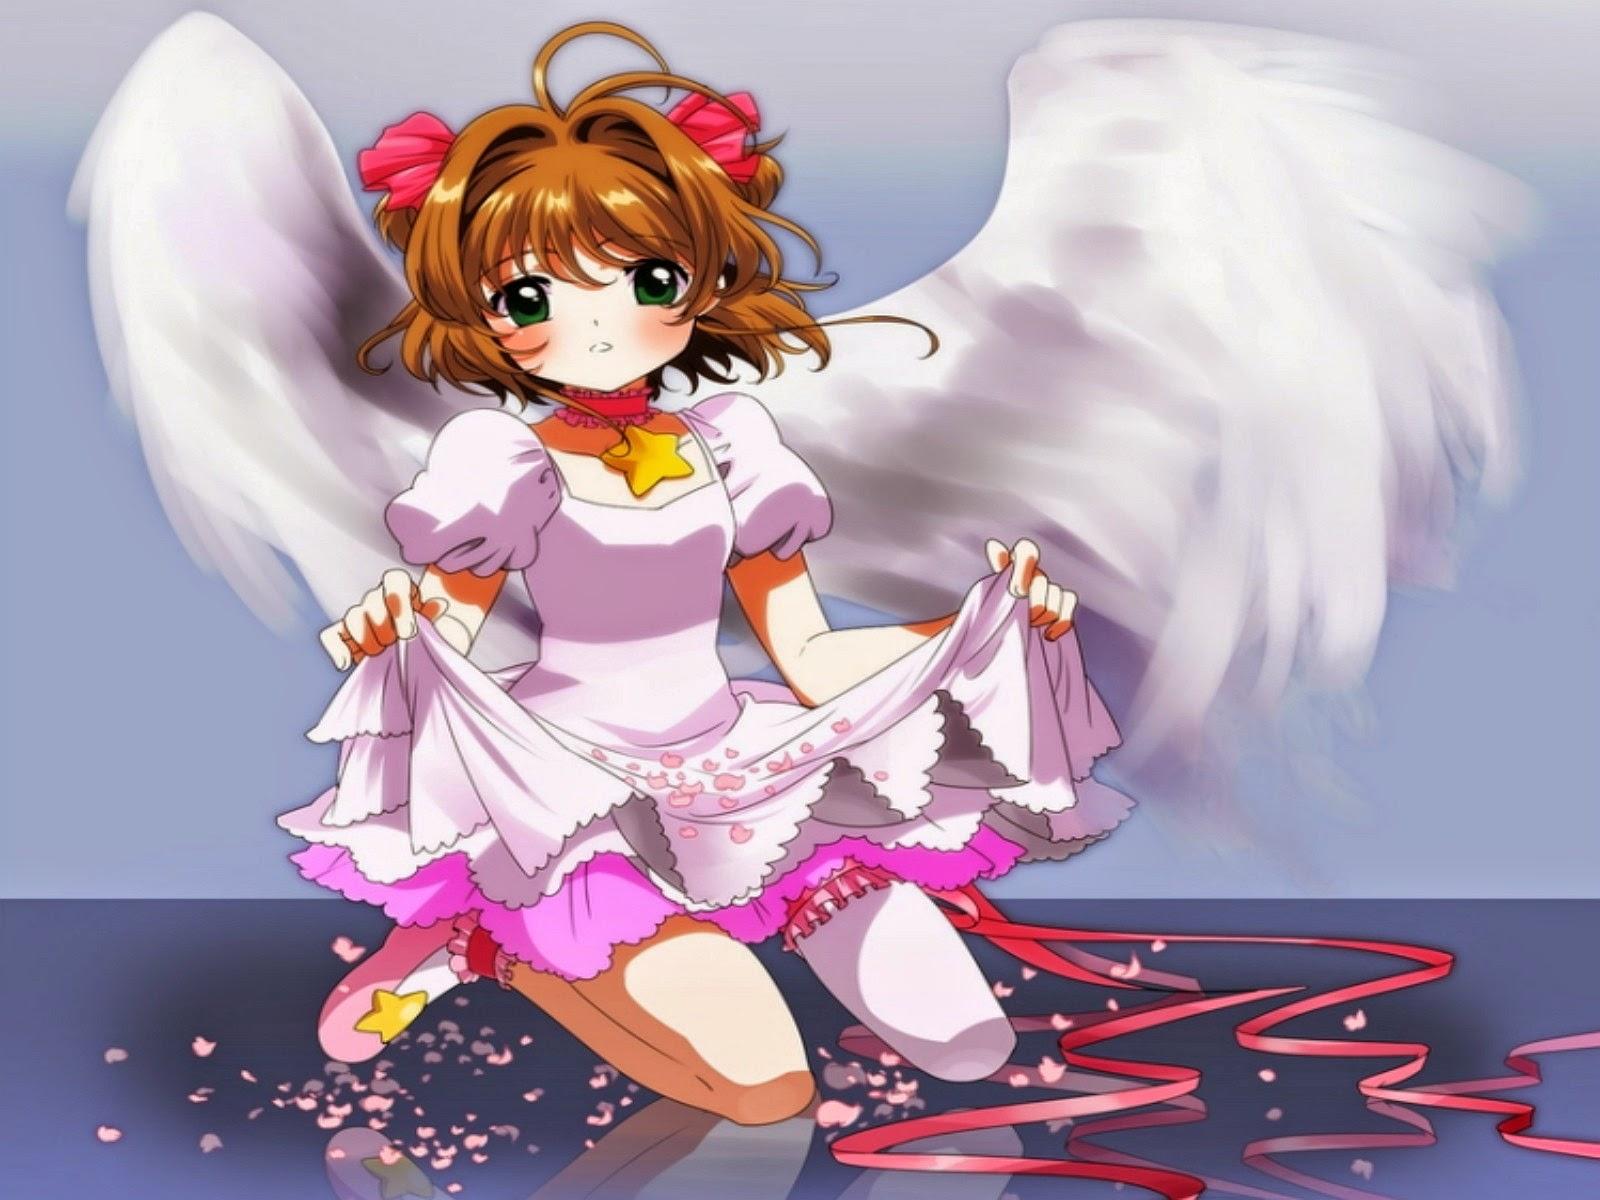 10 wallpaper gadis anime bersayap keren deloiz wallpaper - Foto anime keren hd ...